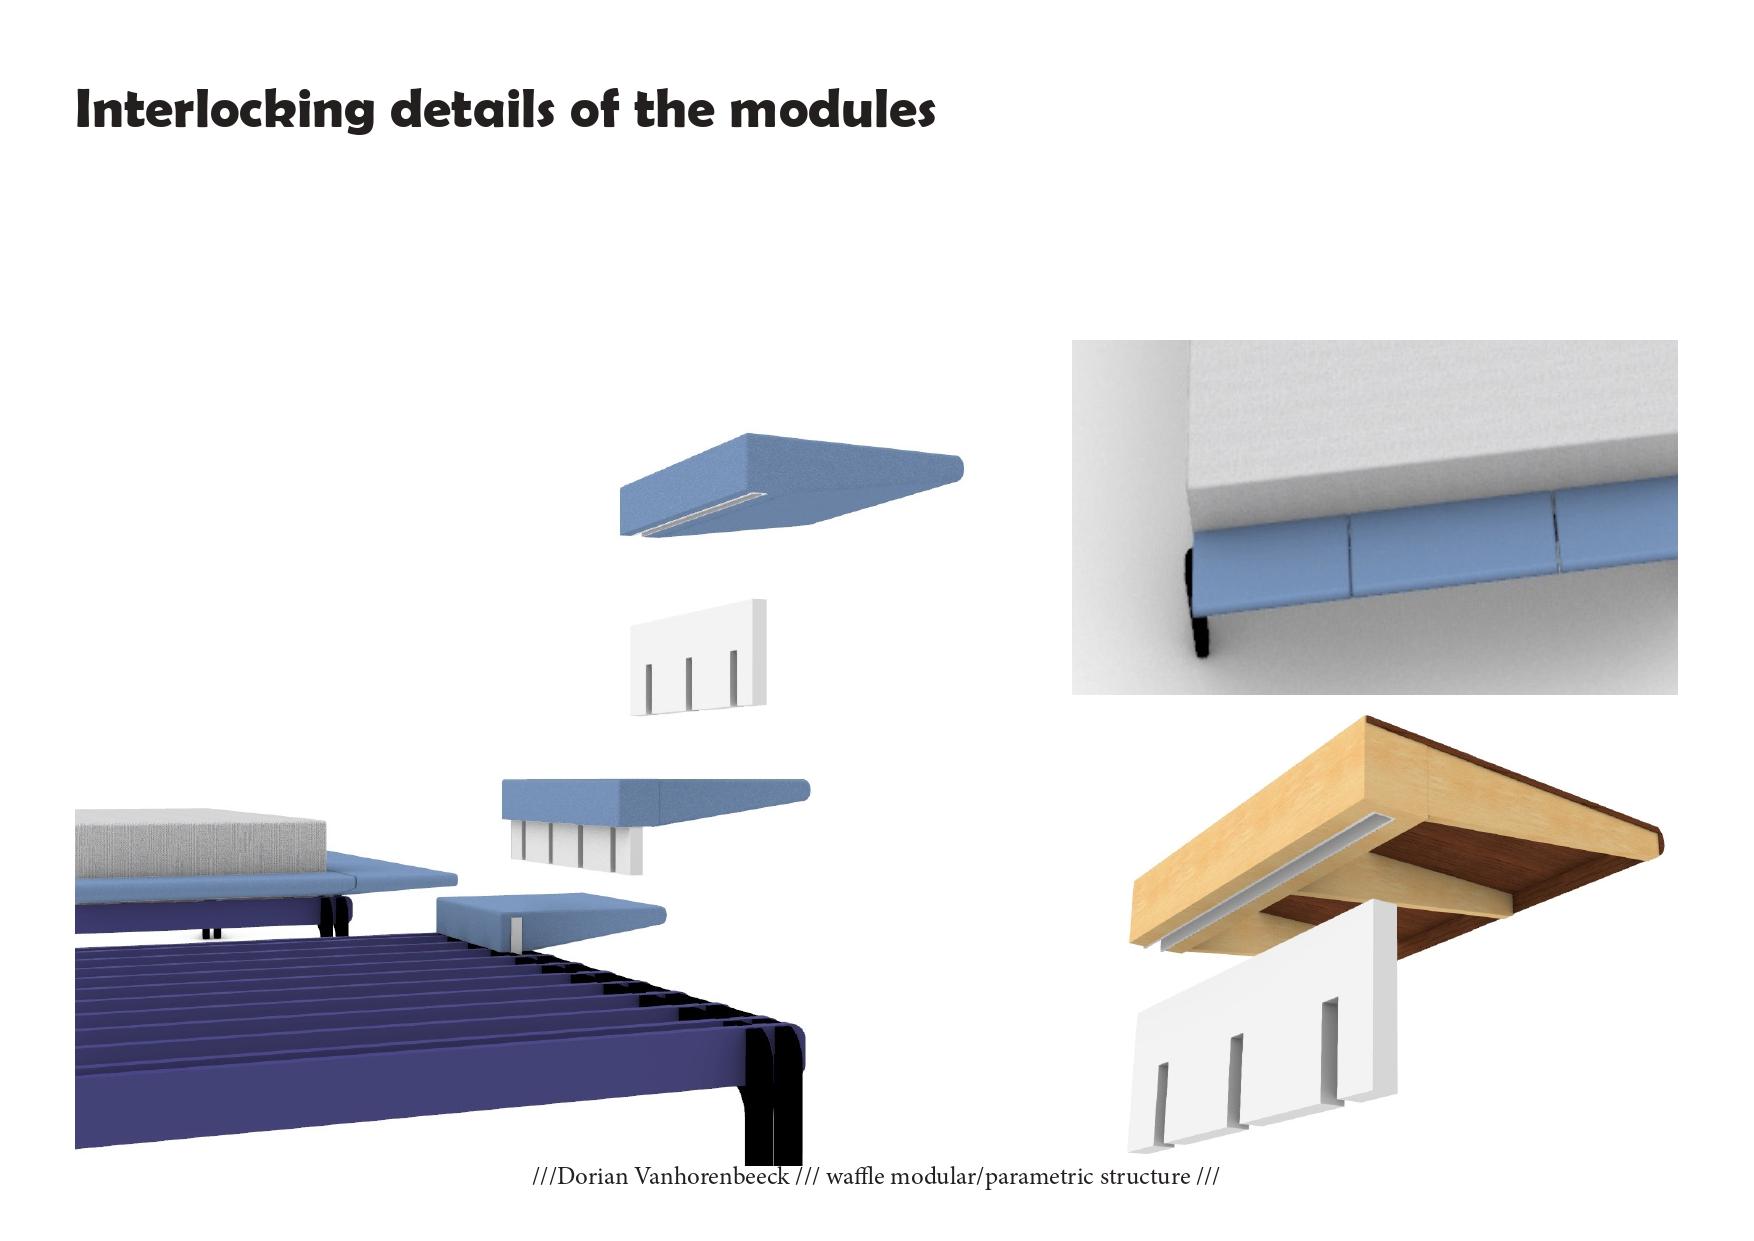 Livret Waffle modular-parametric Structure Dorian Vanhorenbeeck_page-0006